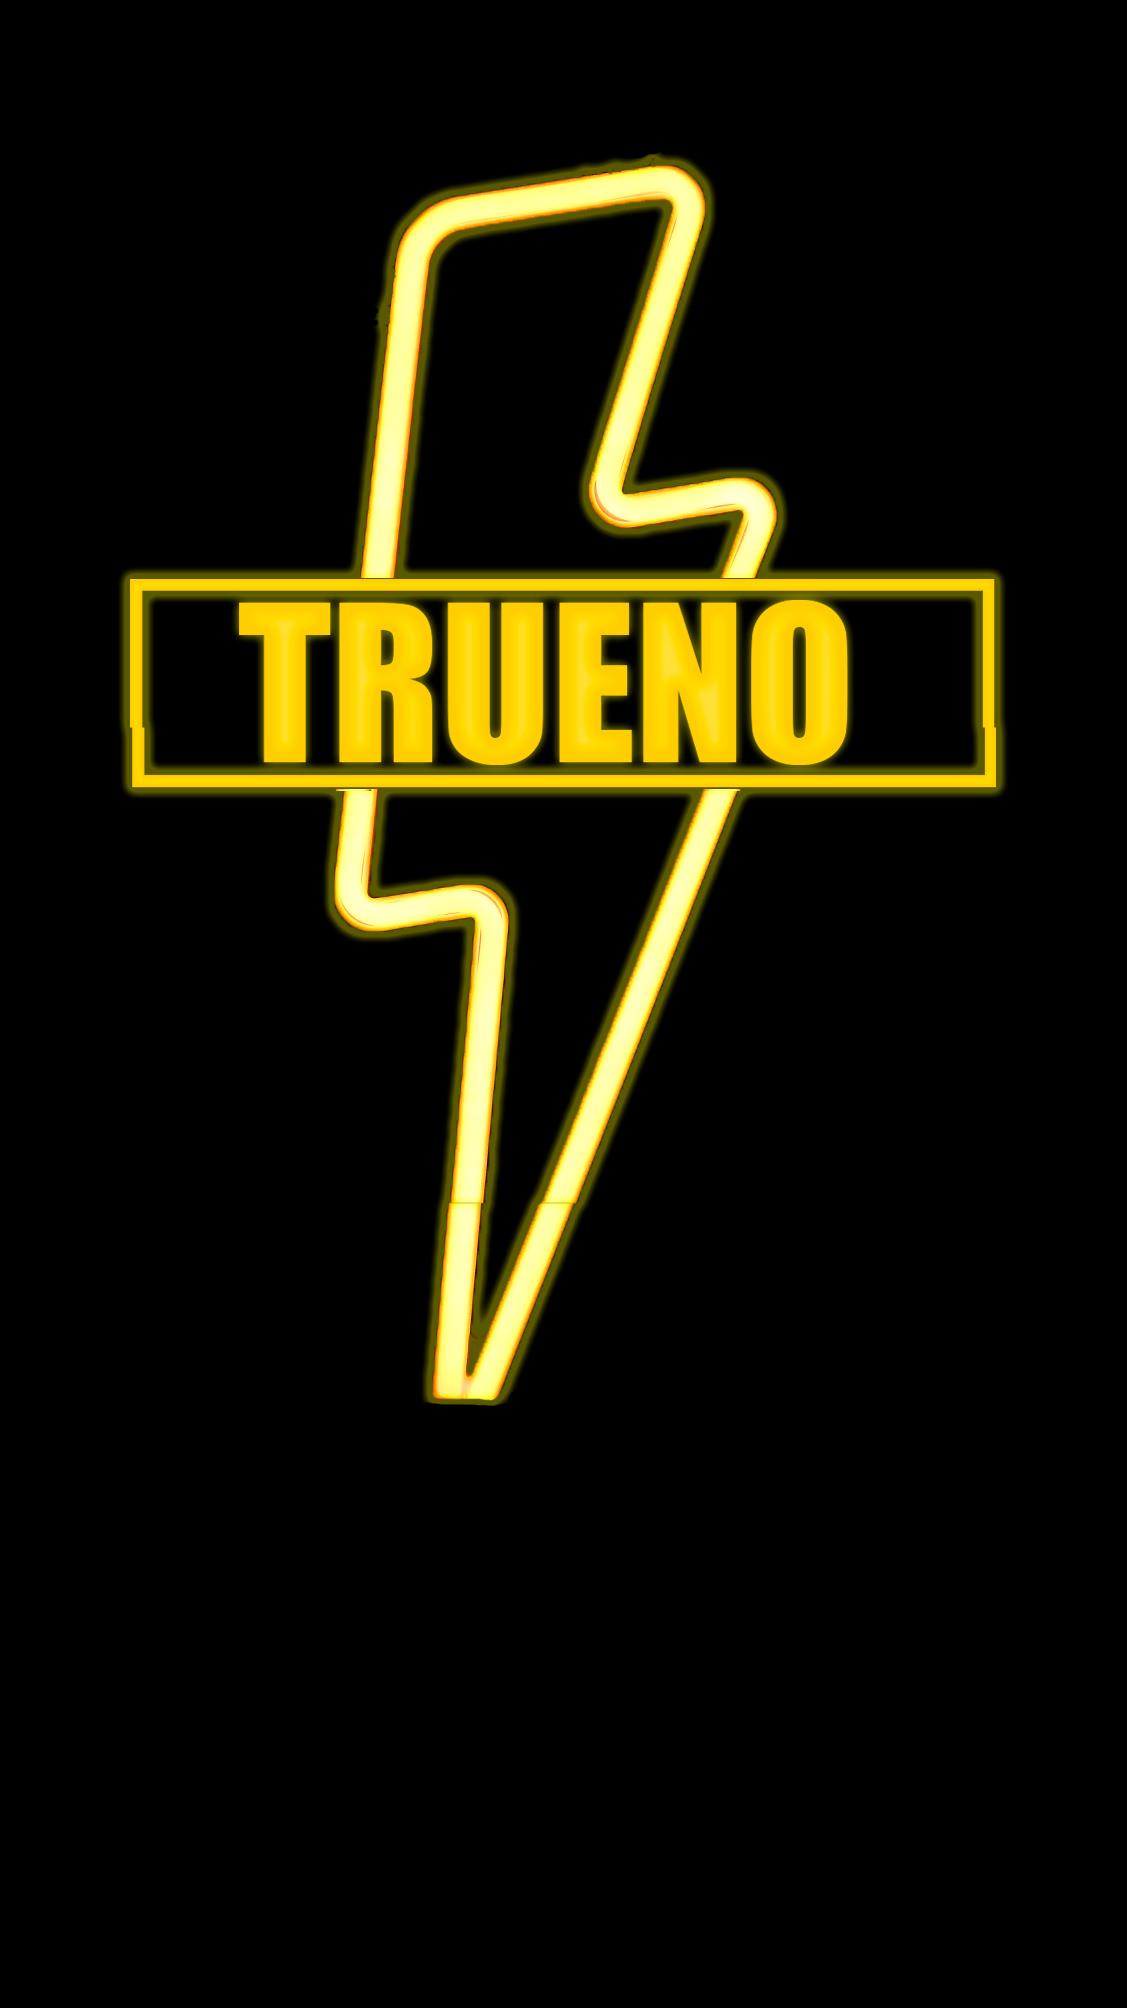 trueno4